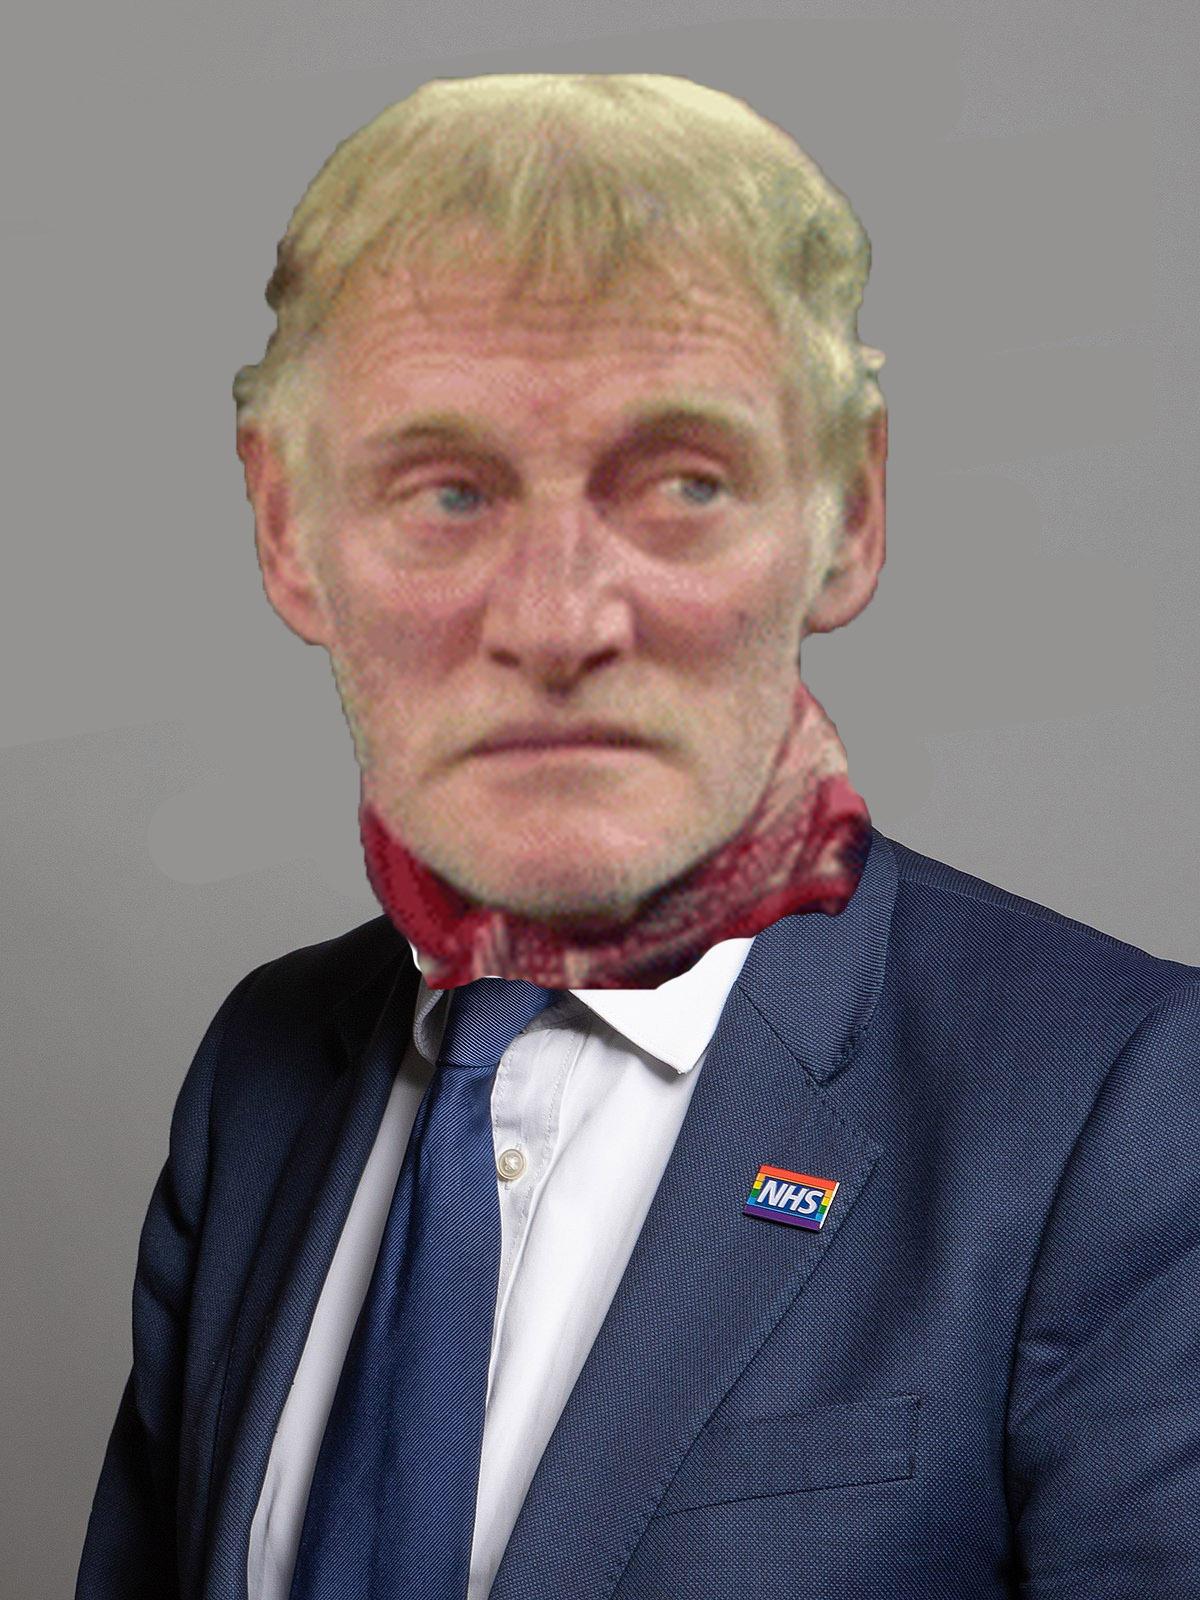 albert hancock steptoe - the junkyard politics of the UK